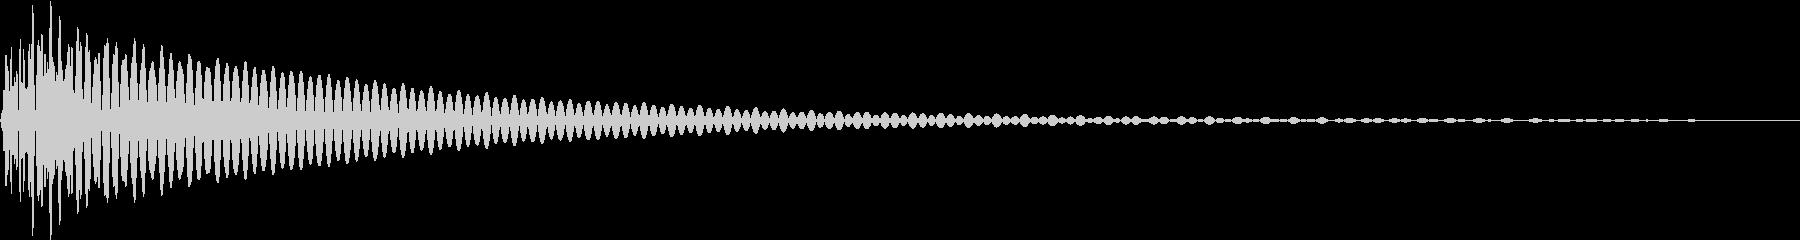 DTM Tom 9 オリジナル音源の未再生の波形